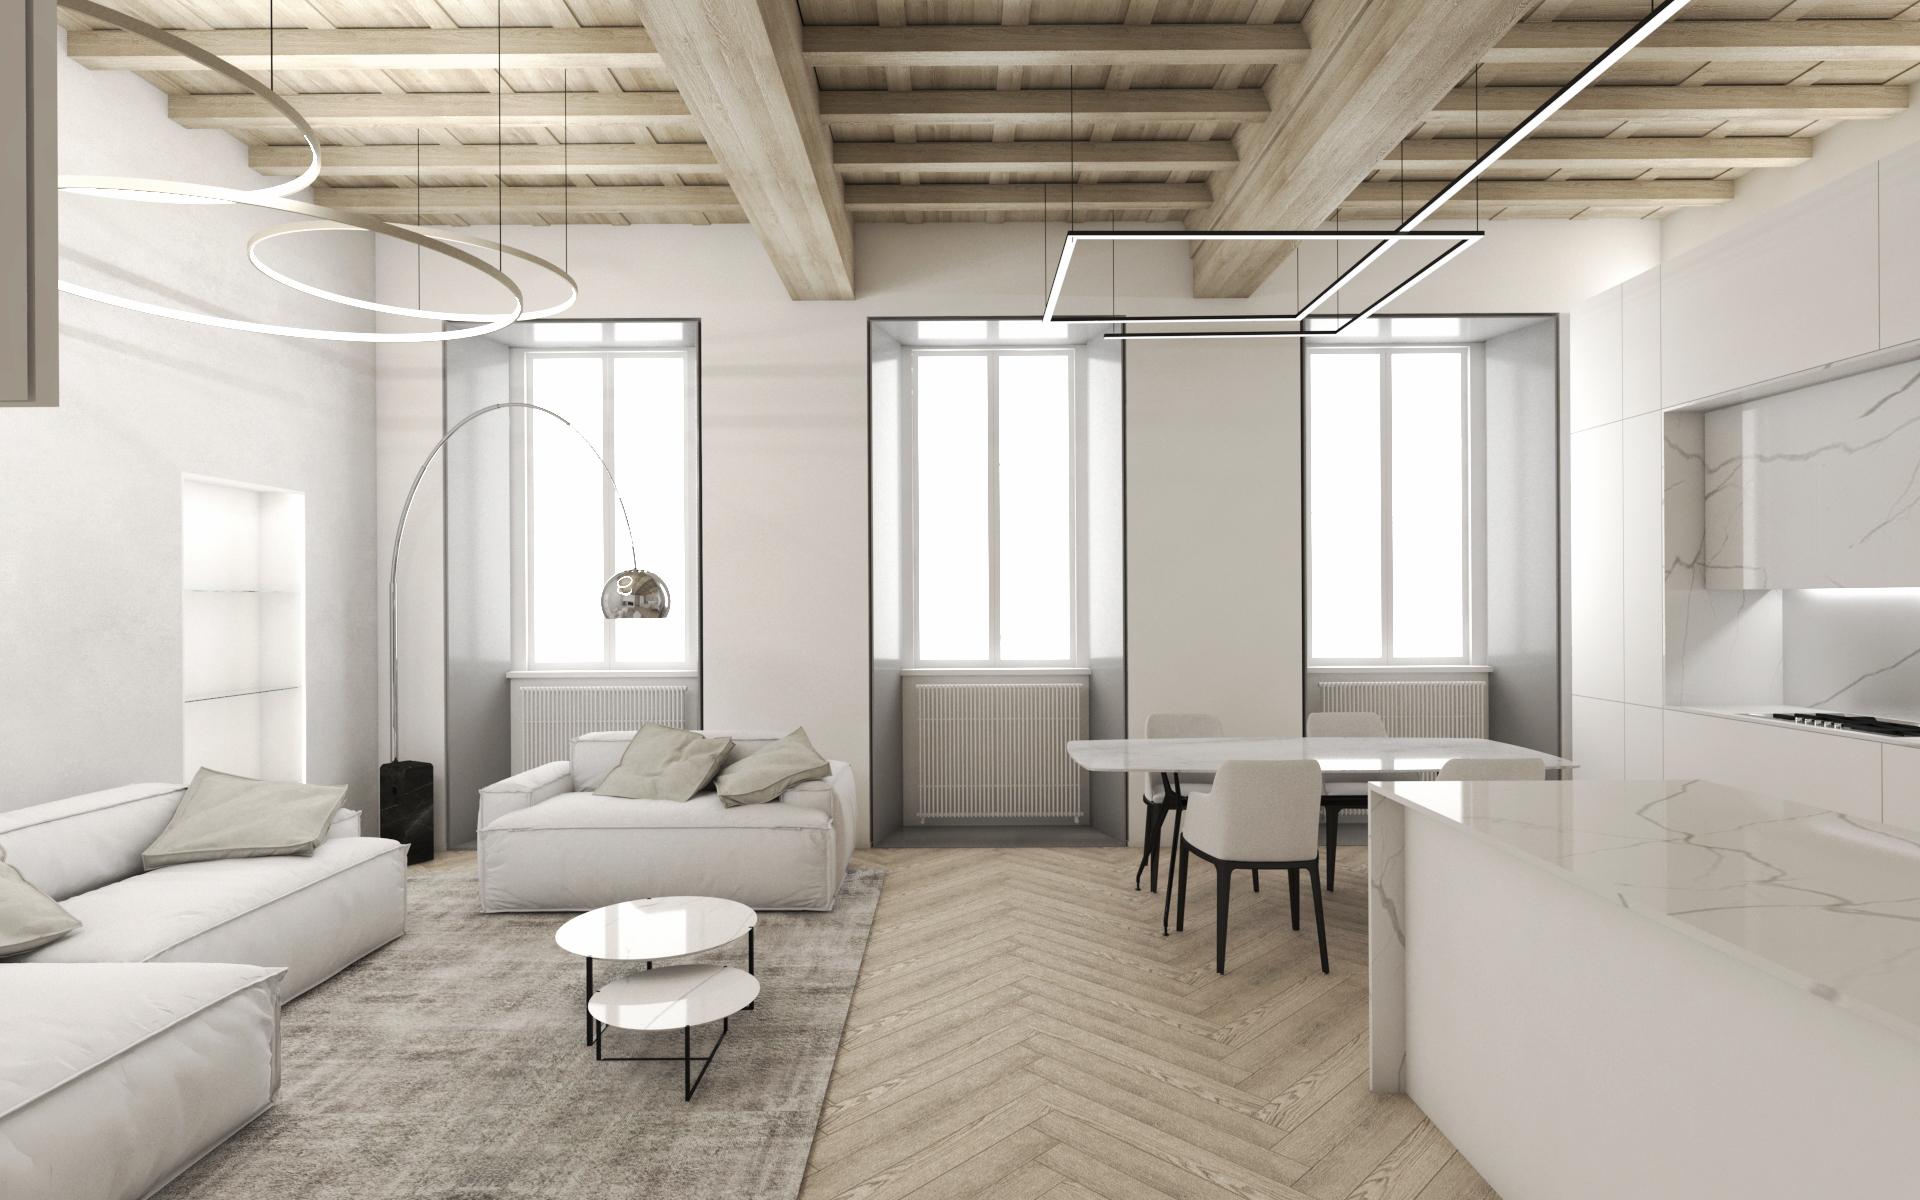 1803_DFG-Architetti-Associati_CASA-GIANNINI_-2